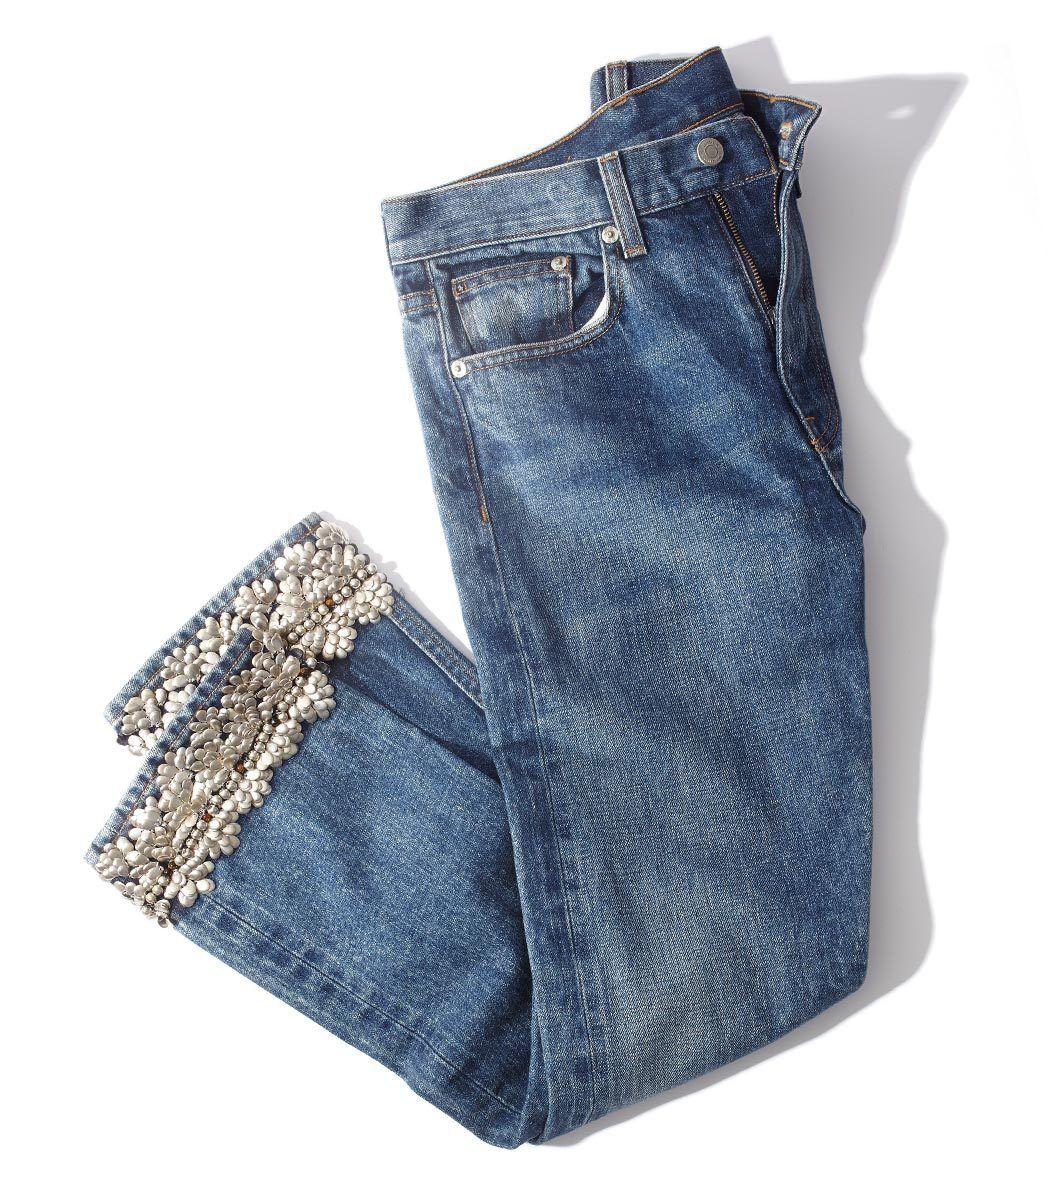 Brock Collection Silver Embellished Jean